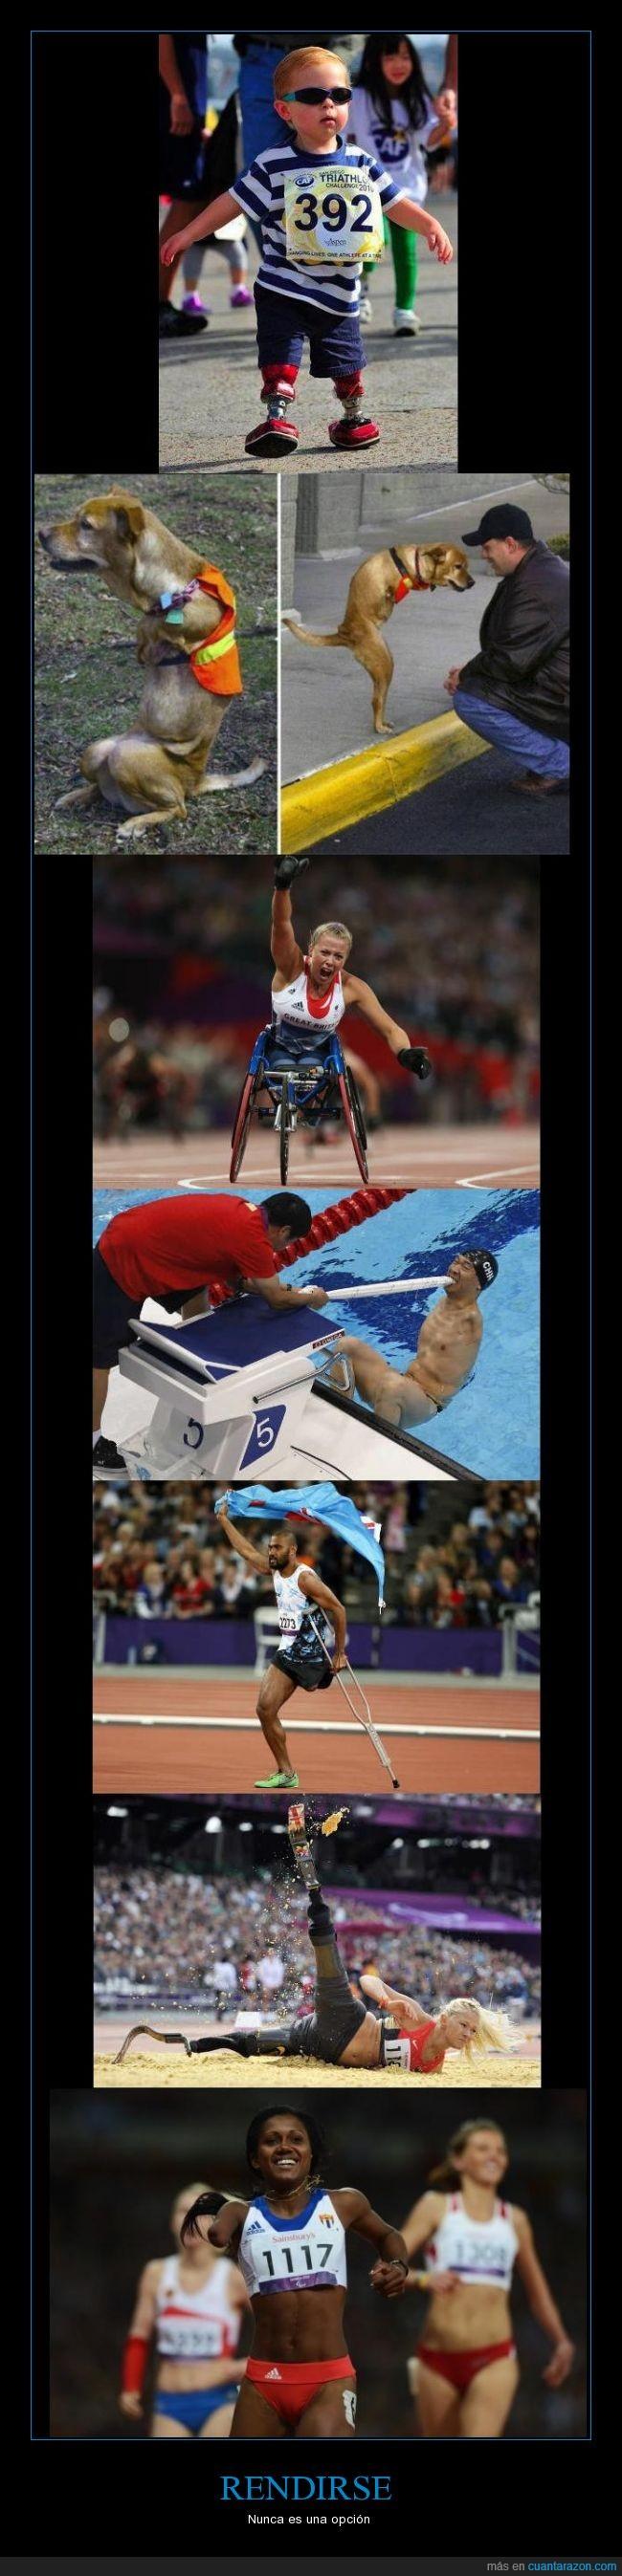 atleta,brazo,chulo,deporte,Esfuerzo,nińo,perro,piernas,rendirse